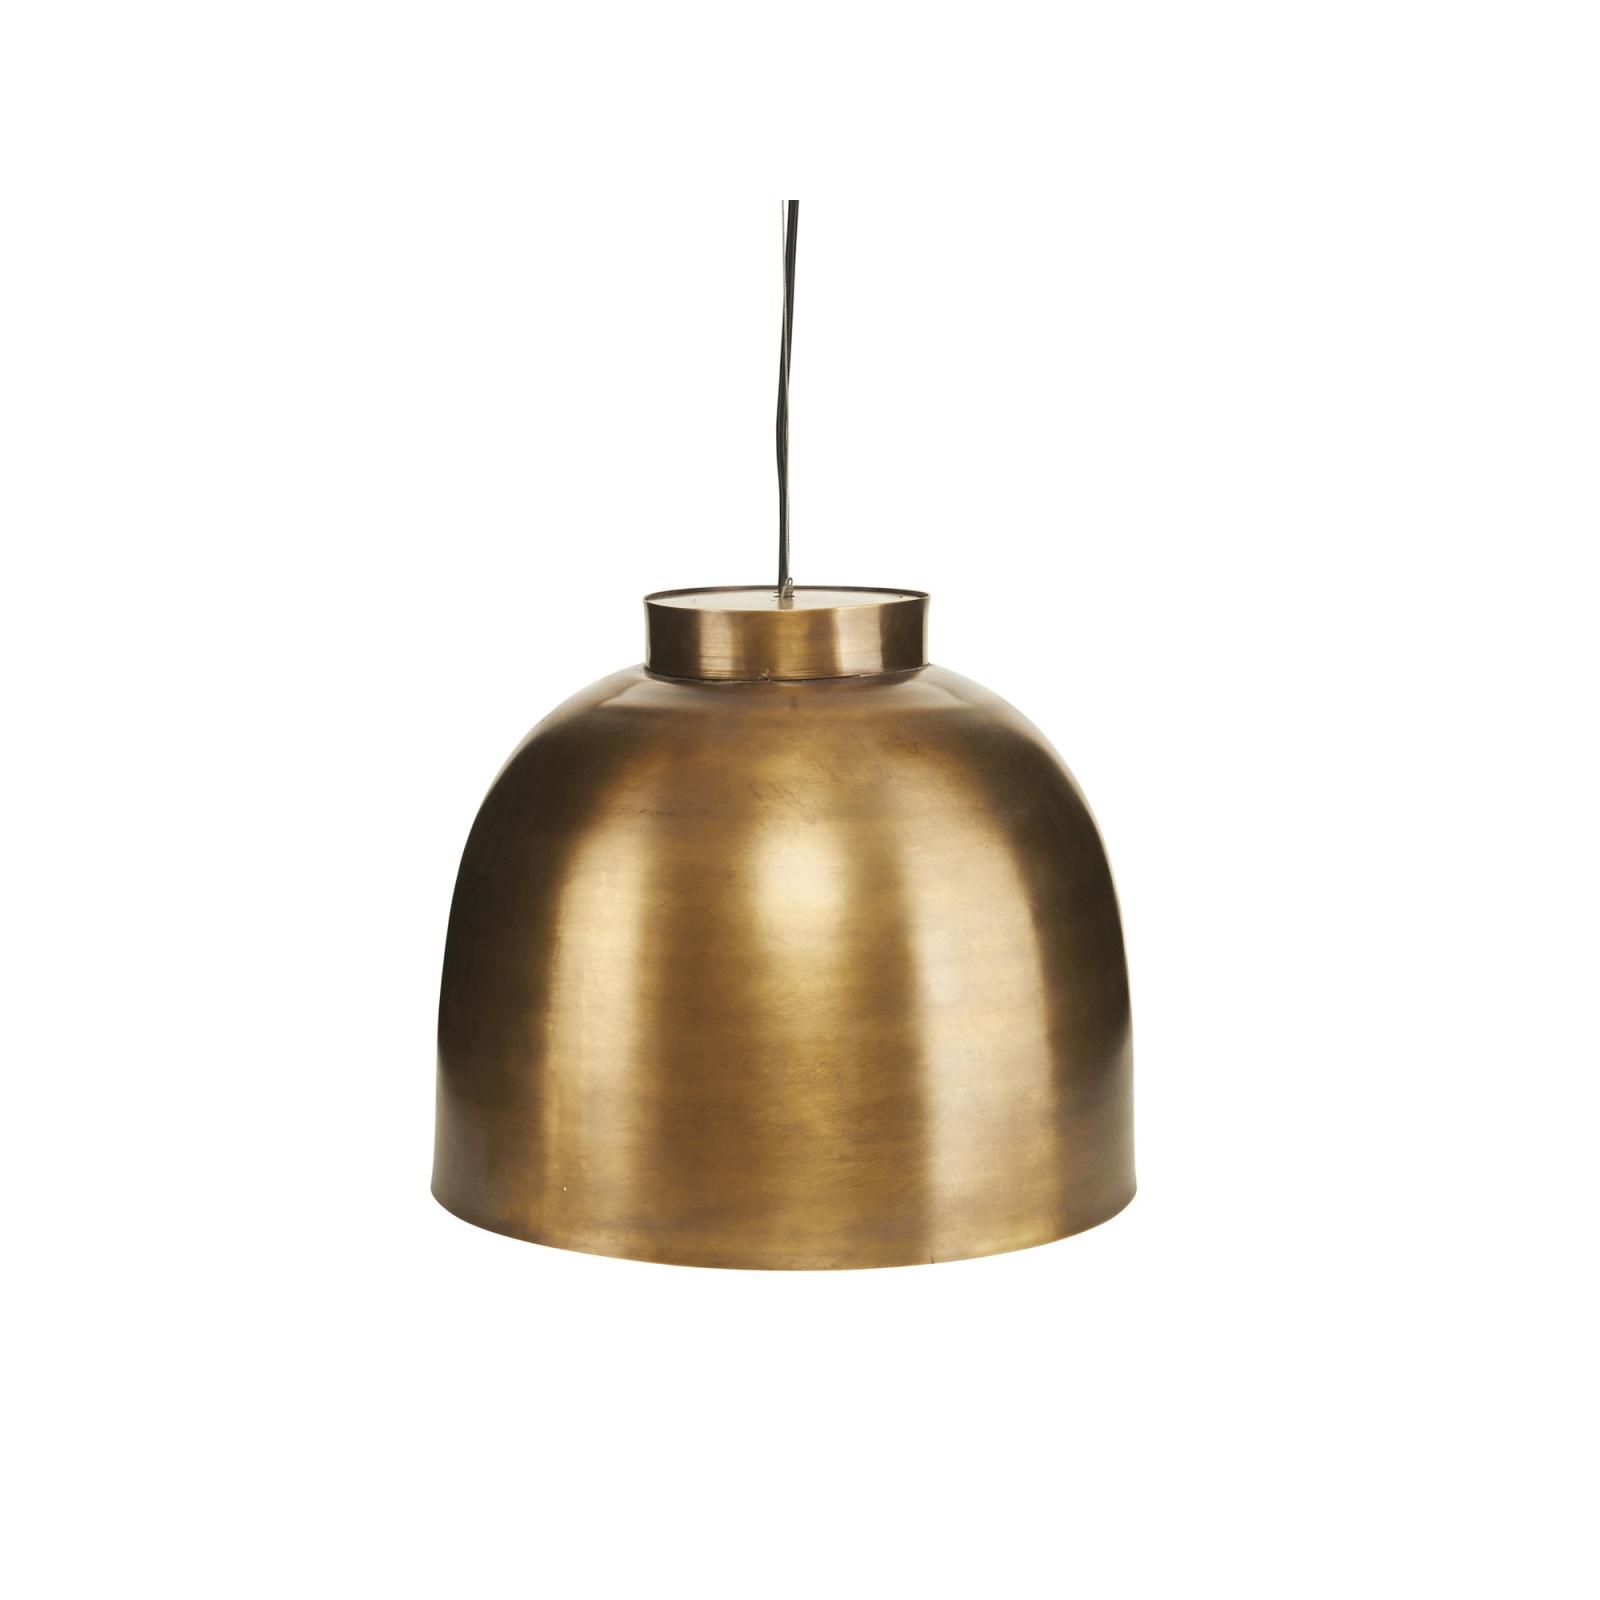 Lampa BOWL, Cb0960 mässing, House Doctor